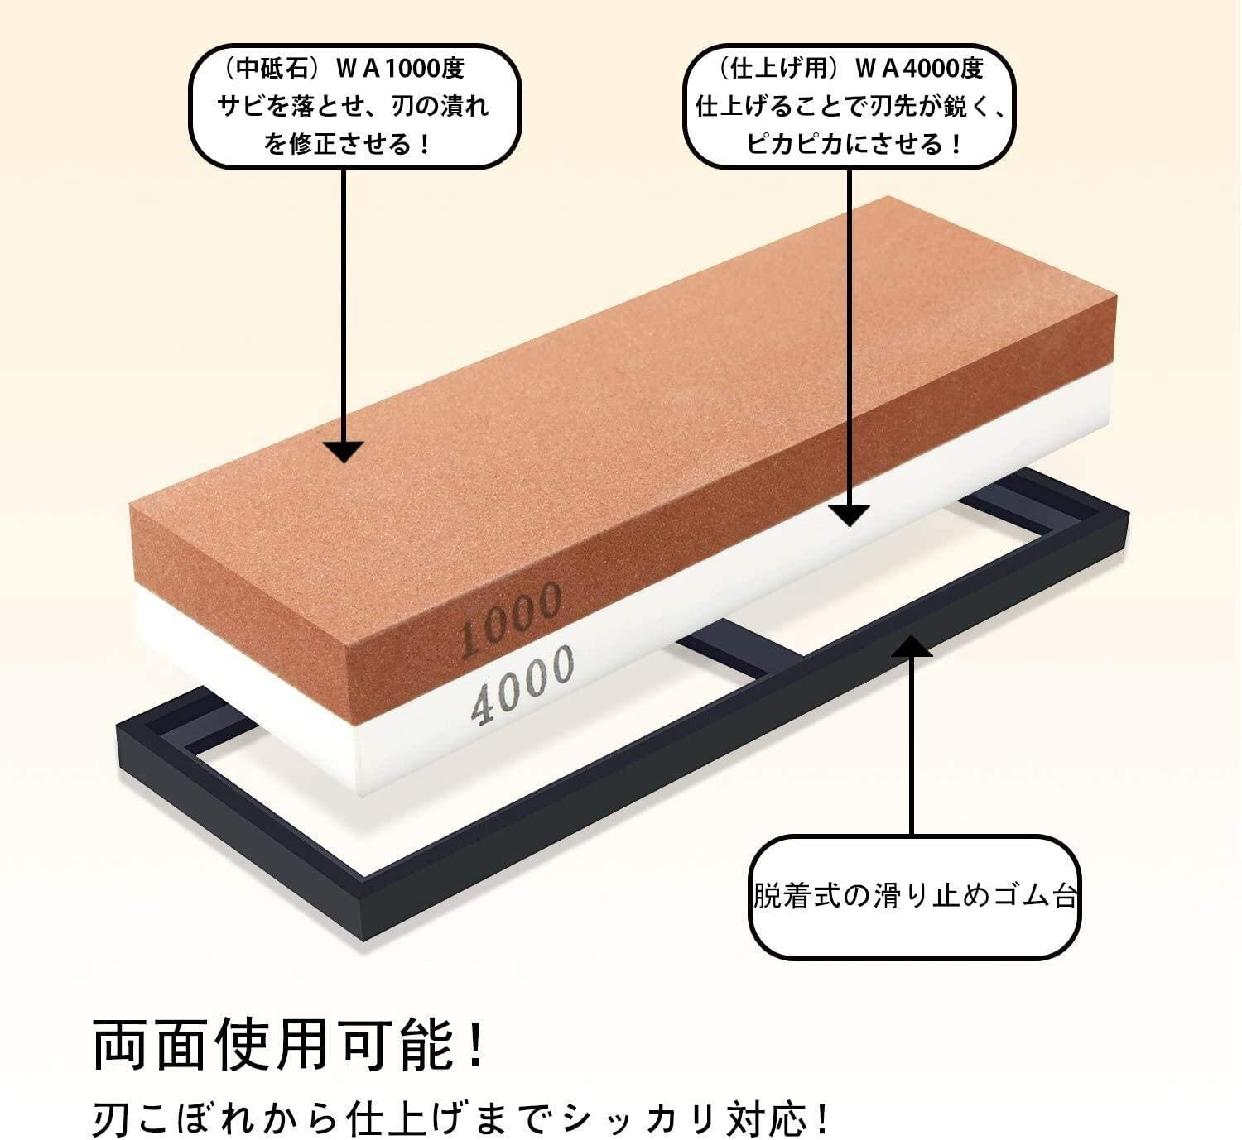 Hiveseen 両面包丁用砥石 レッドの商品画像4